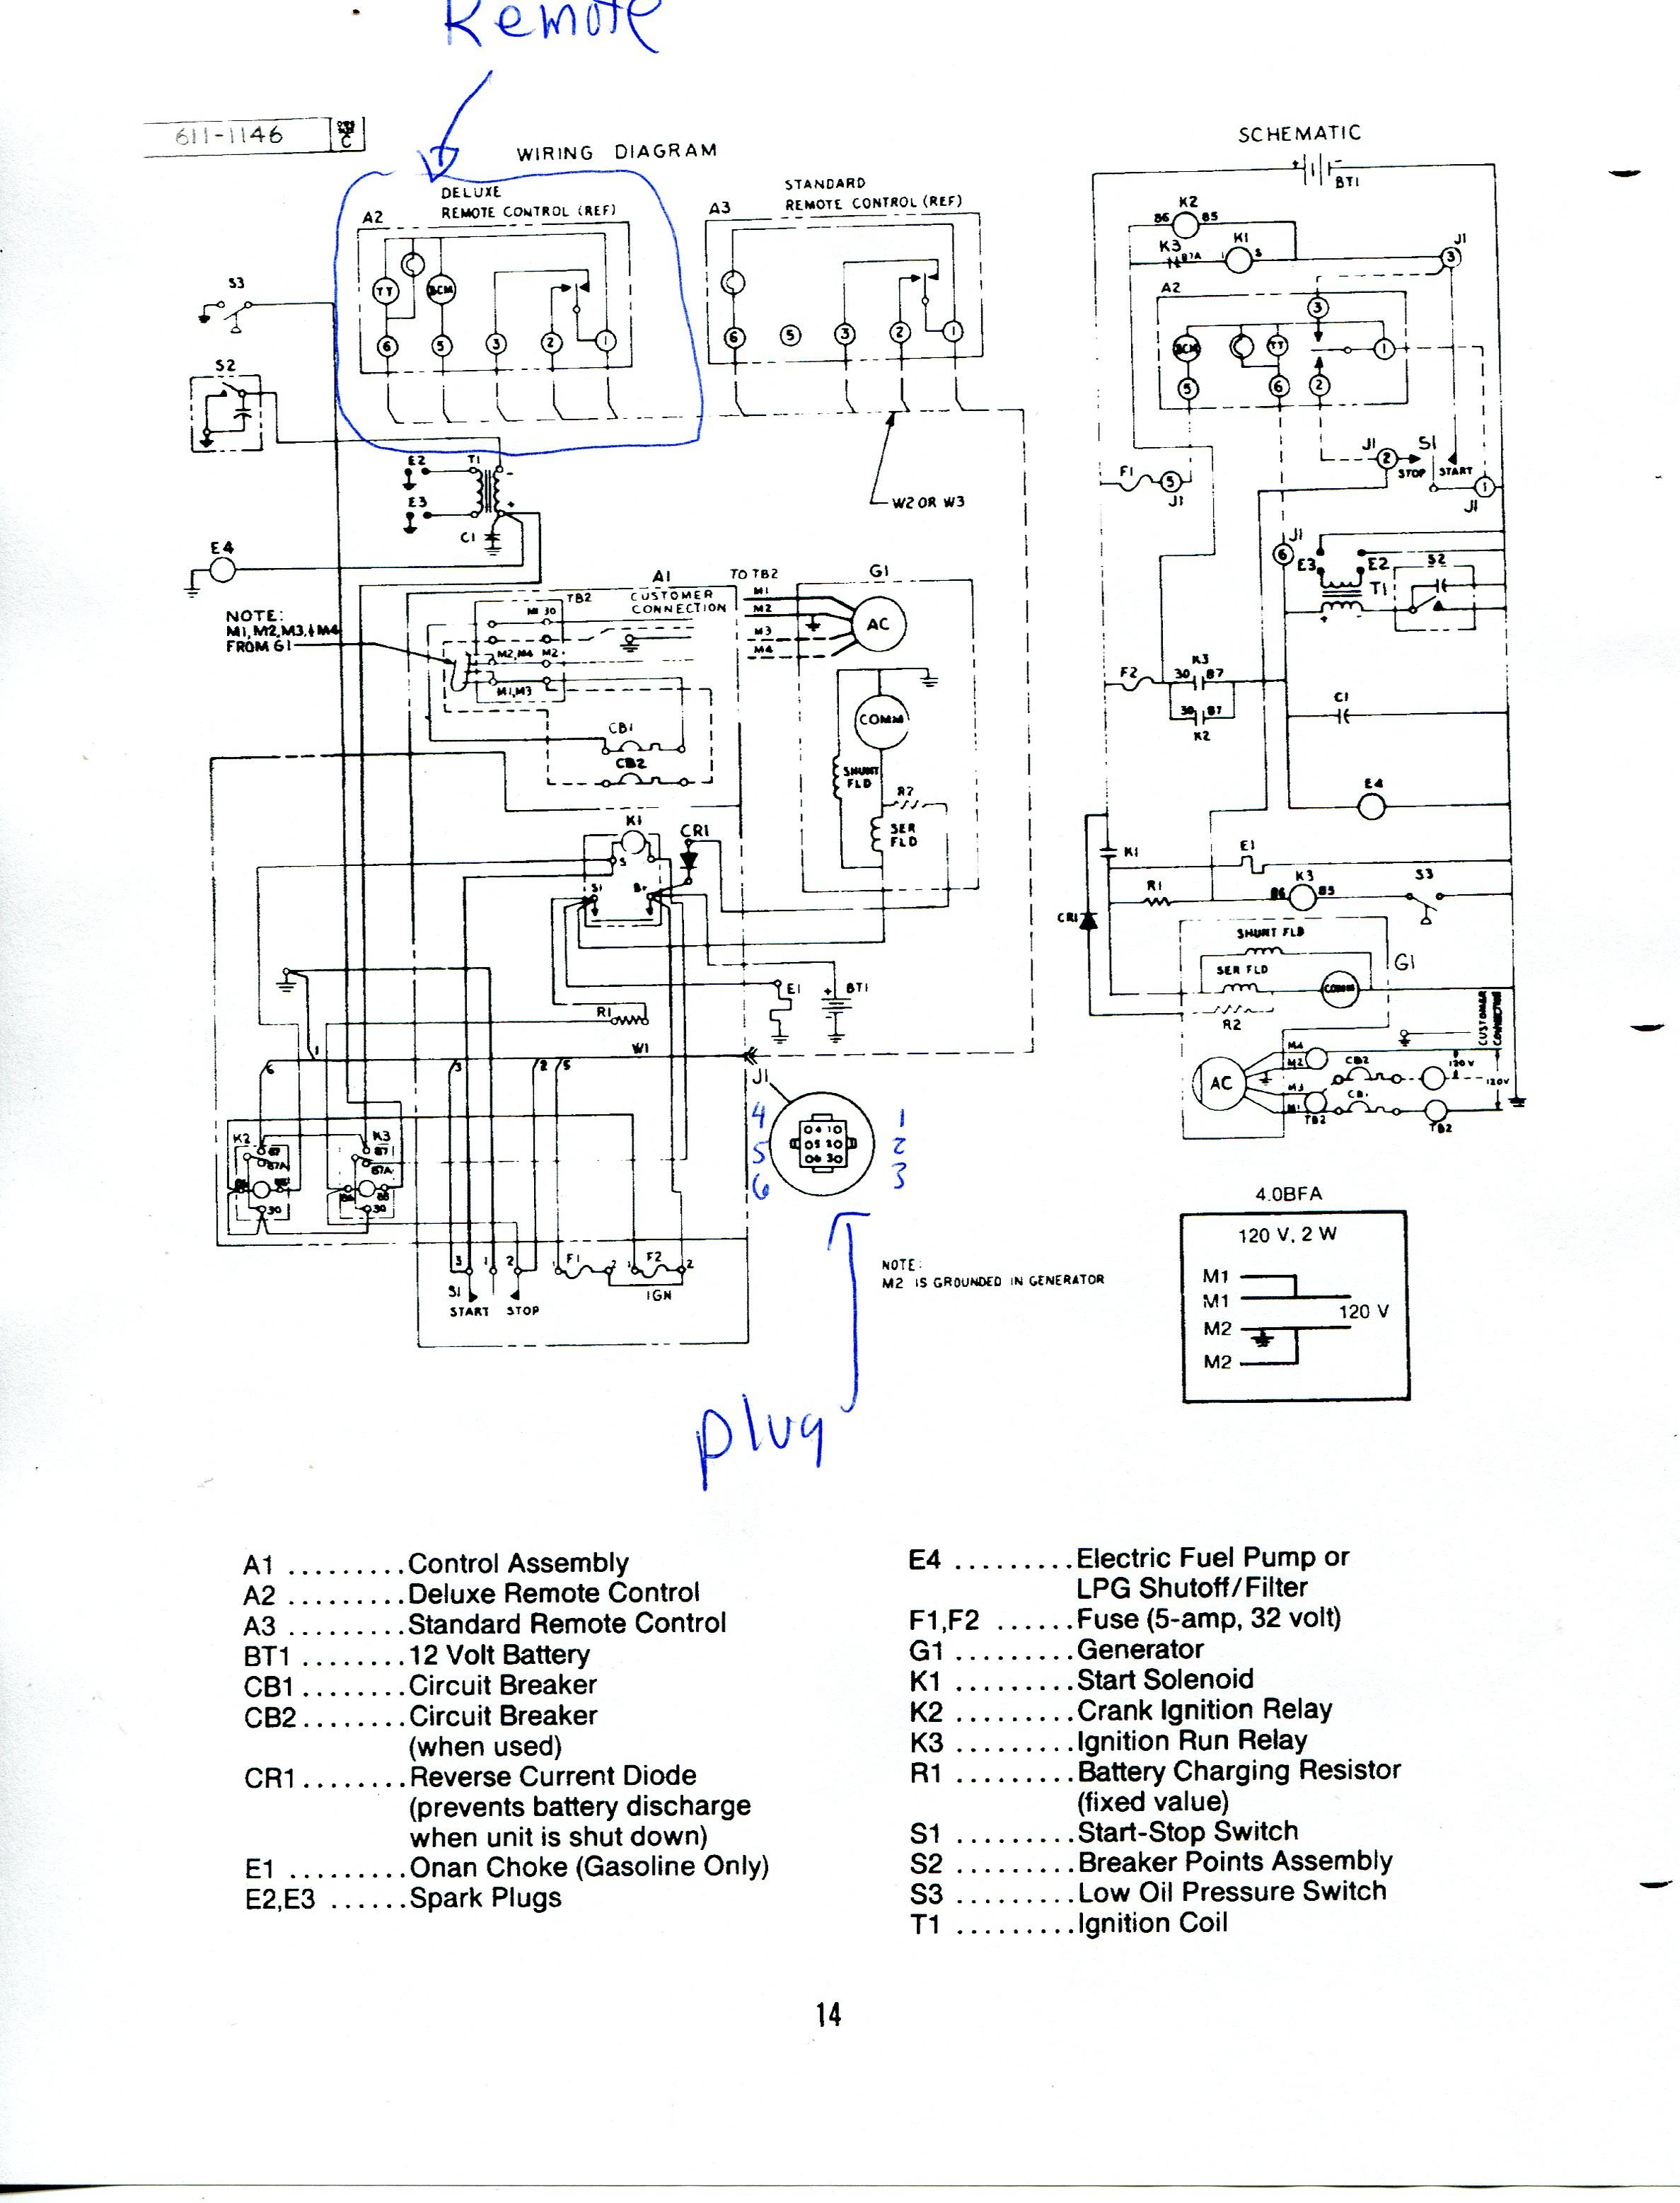 honda ev6010 wiring diagram 33 honda generator remote start wiring diagram wiring diagram list  33 honda generator remote start wiring